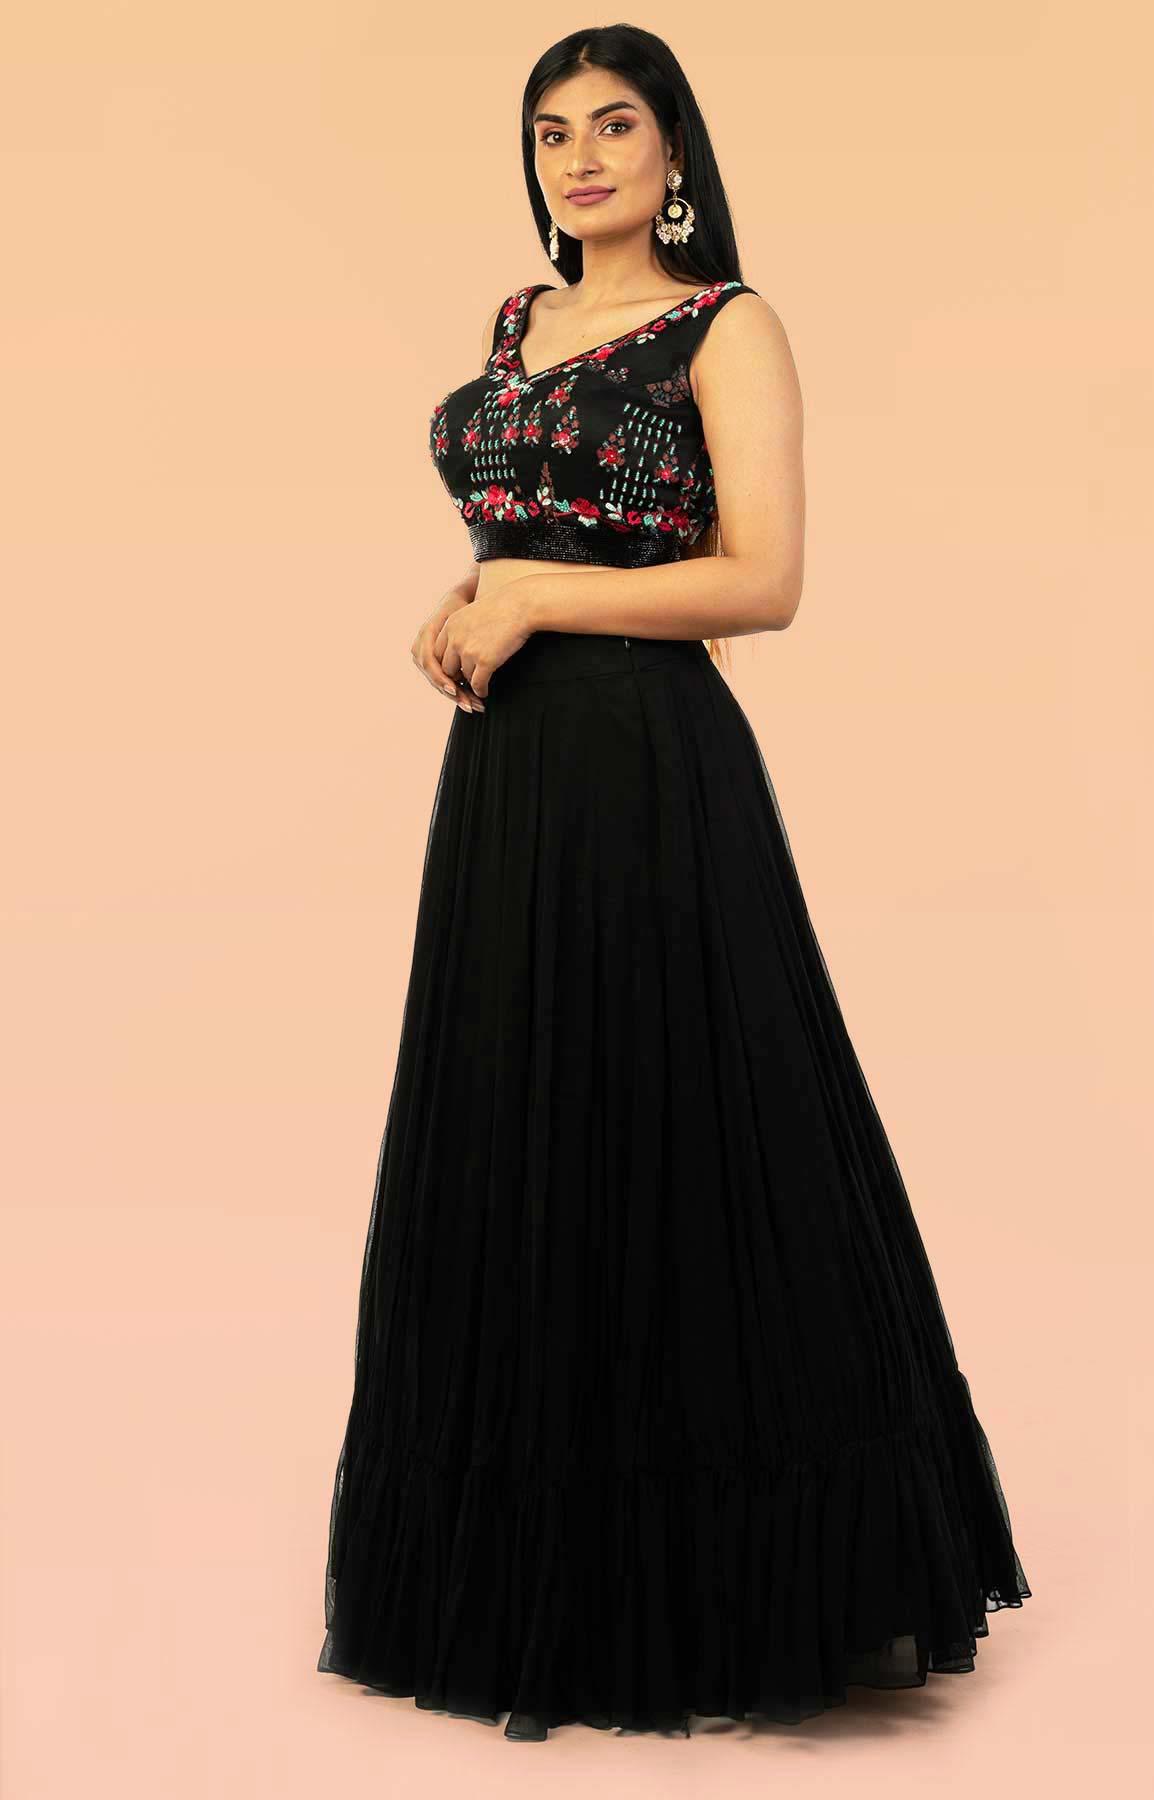 Black Georgette Lehenga With Organza Floral Print And Bead Work Blouse – Viraaya By Ushnakmals